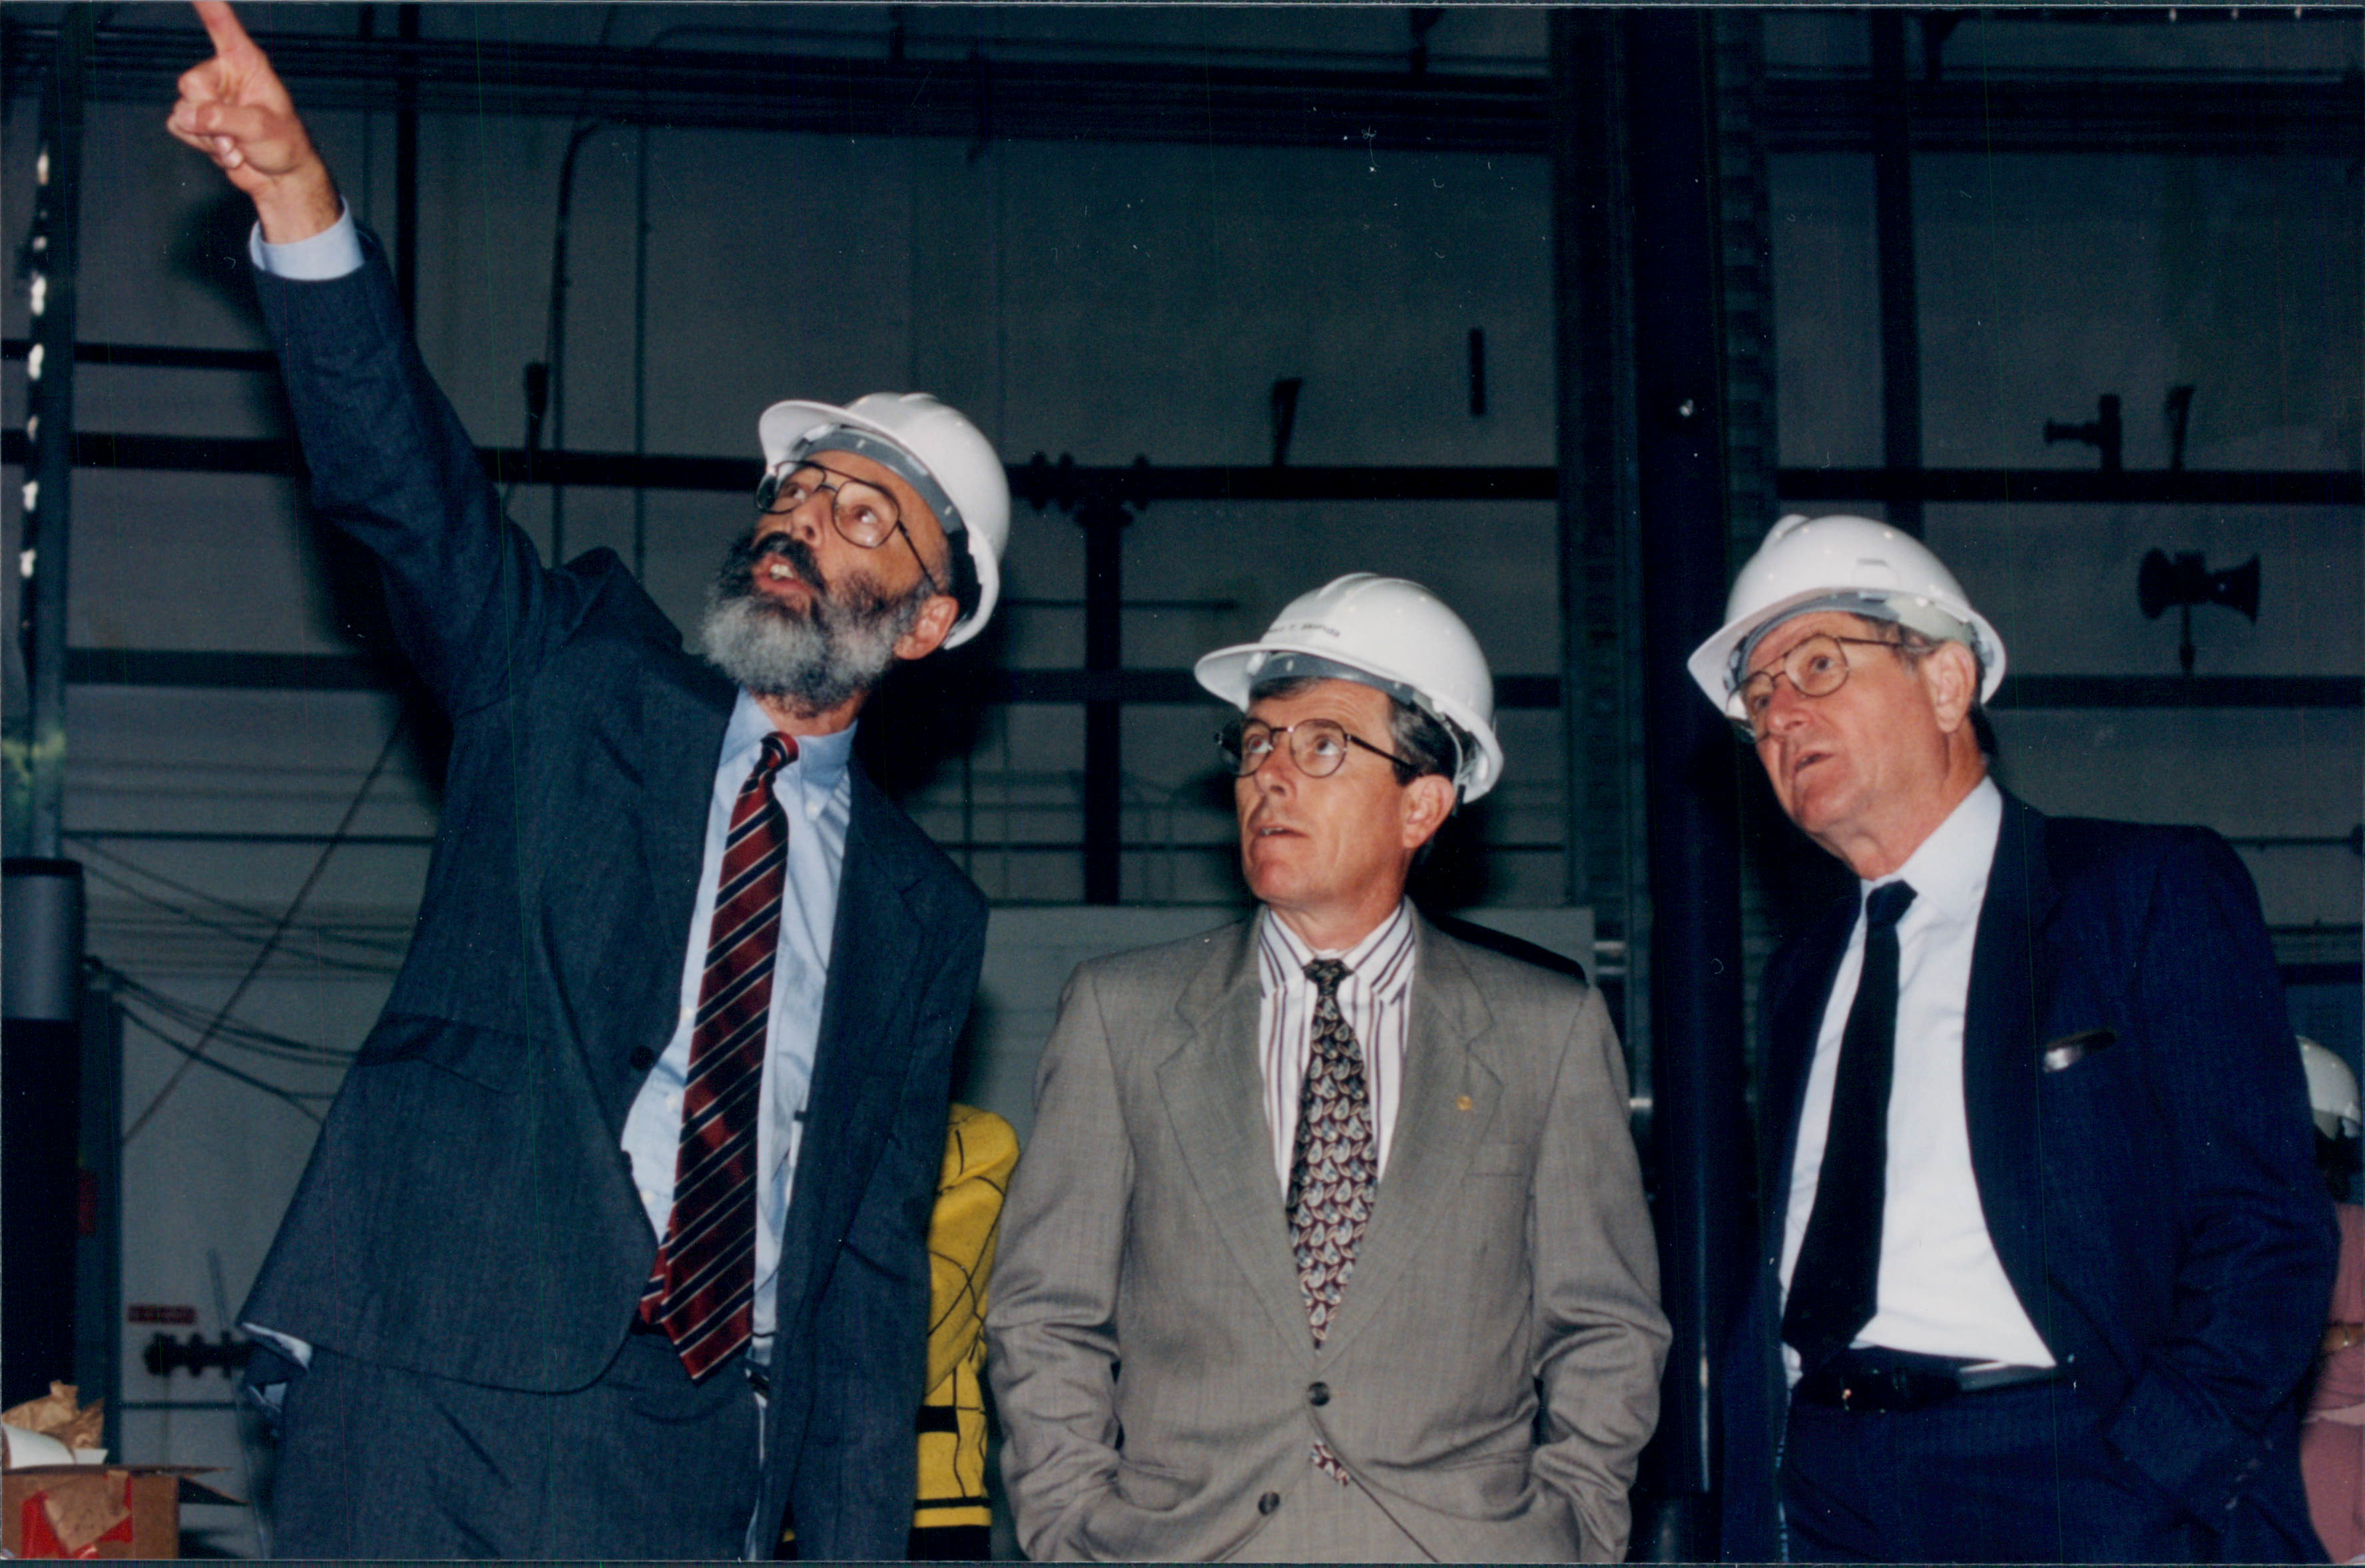 Nathan Isgur, Energy Secretary Robert Skunda, Hermann Grunder